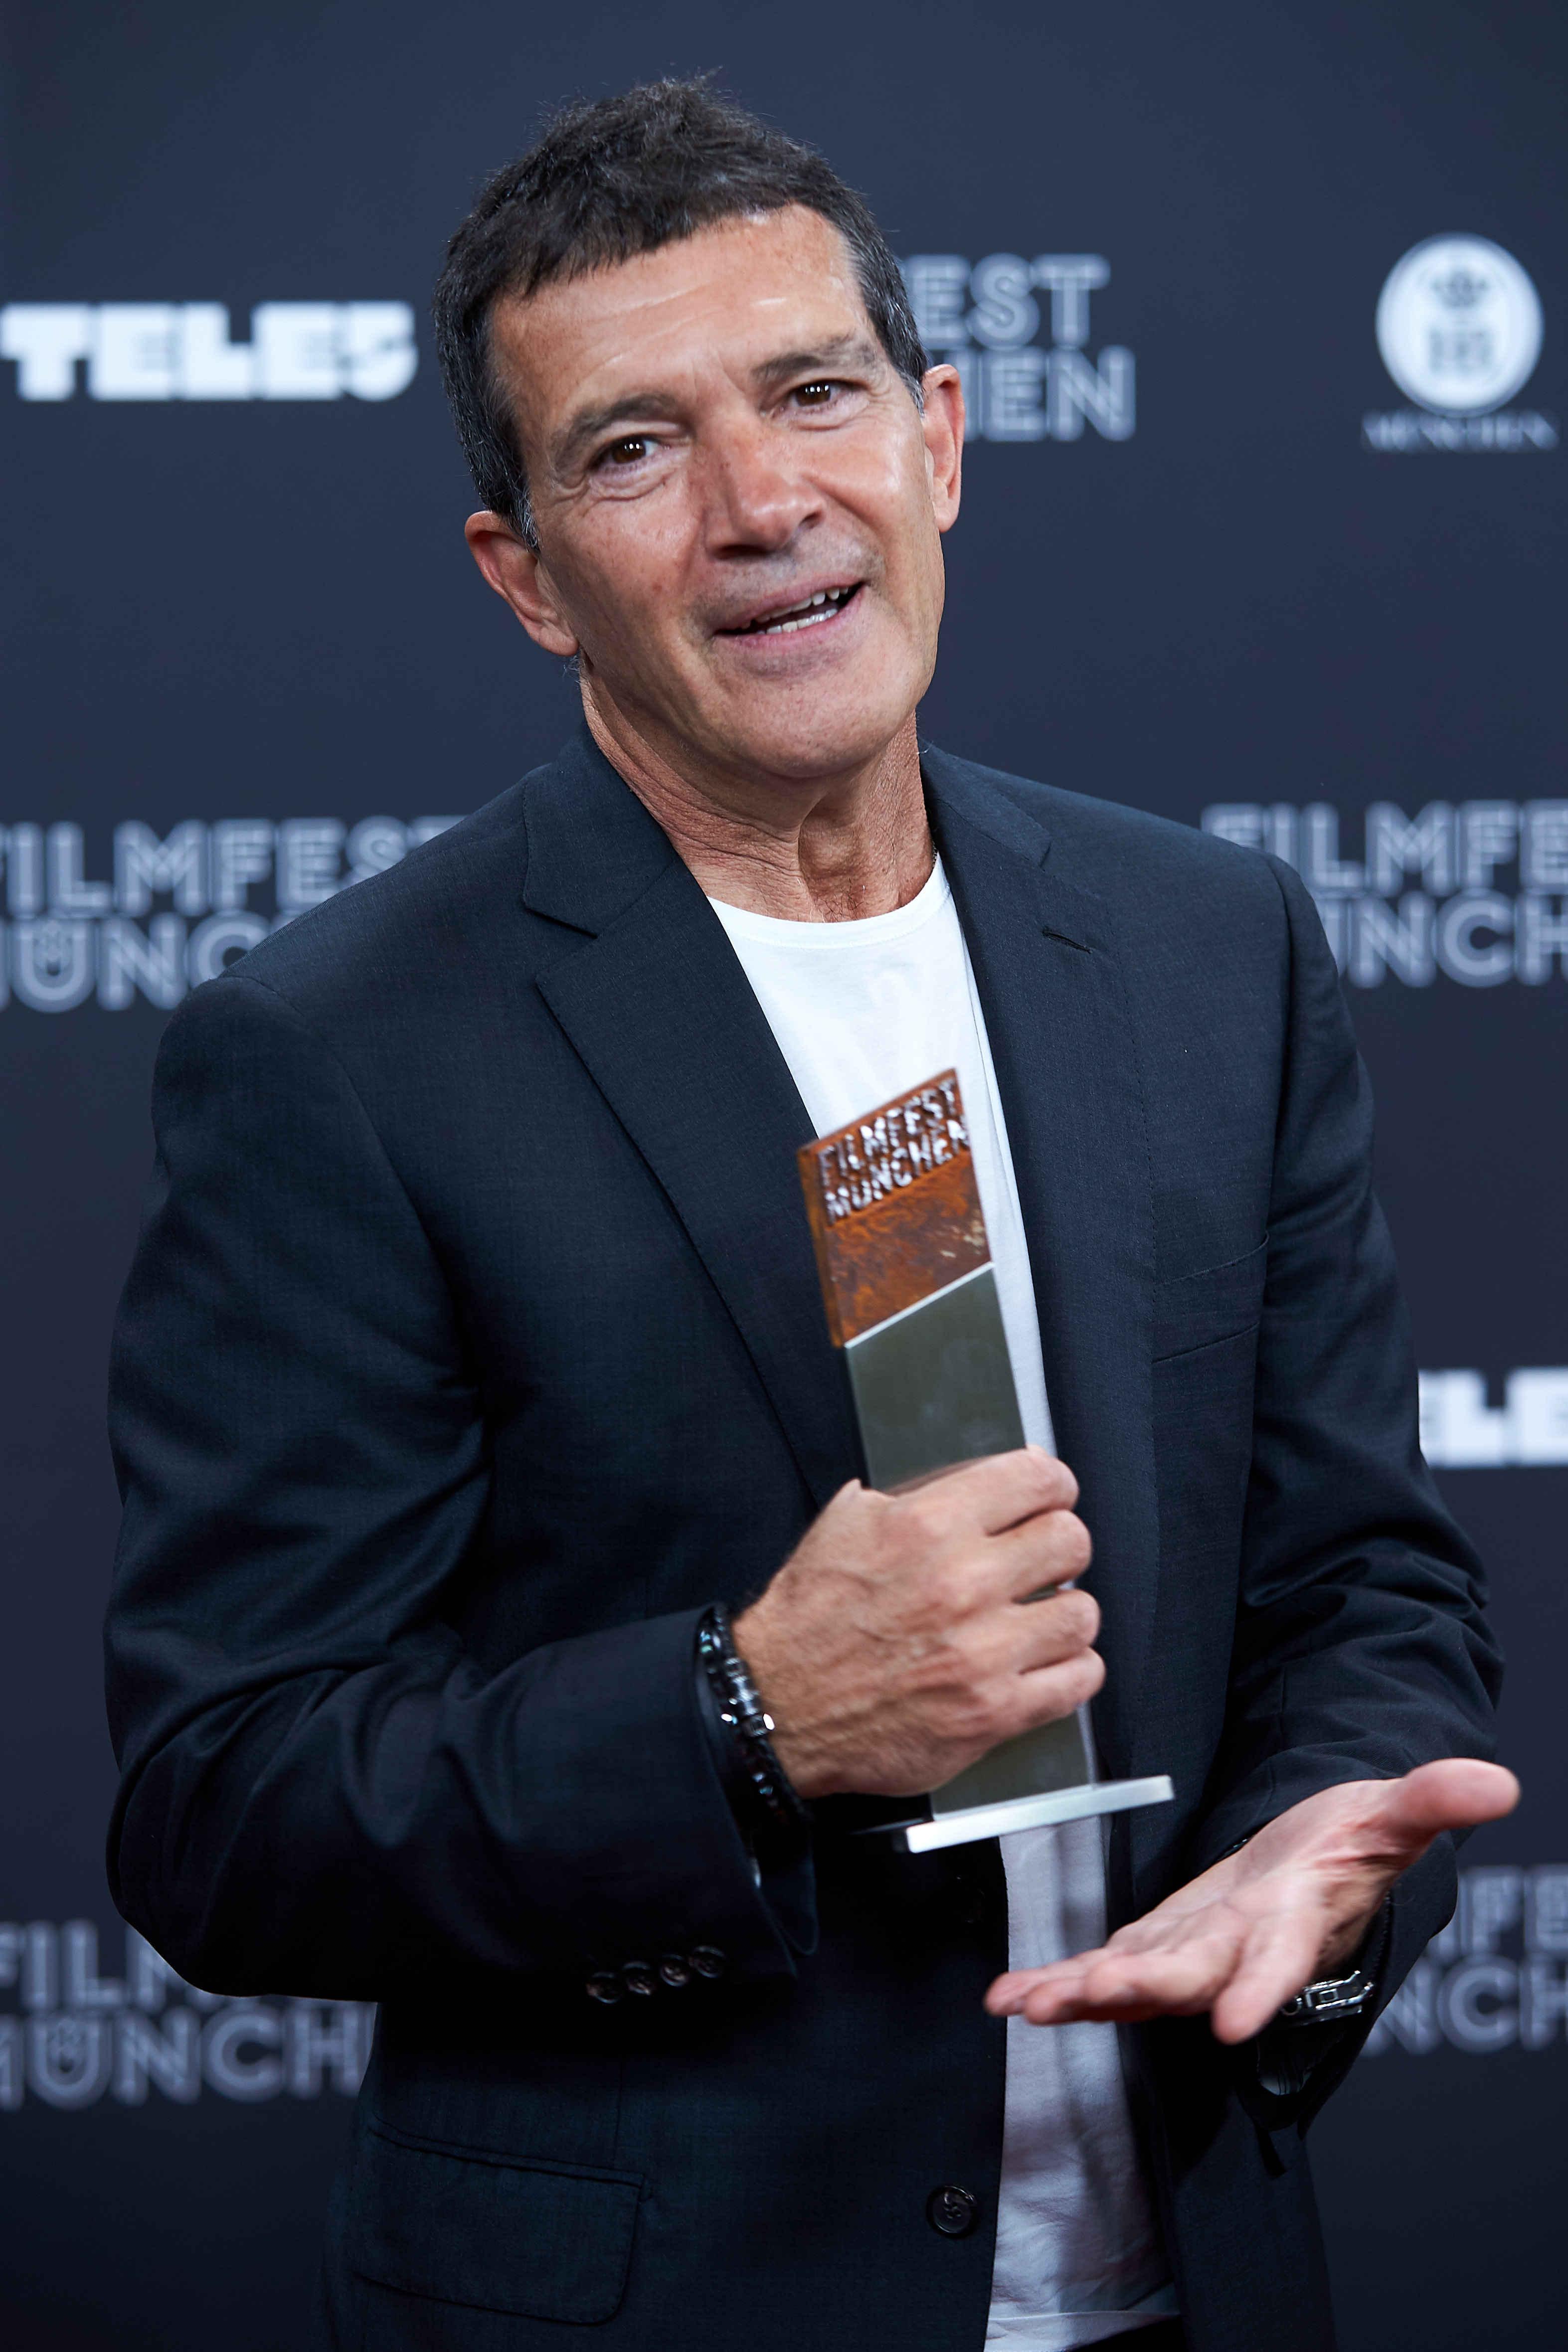 Antonio Banderas holds the Cinemerit Award at the Munich Film Festival on June 29, 2019.